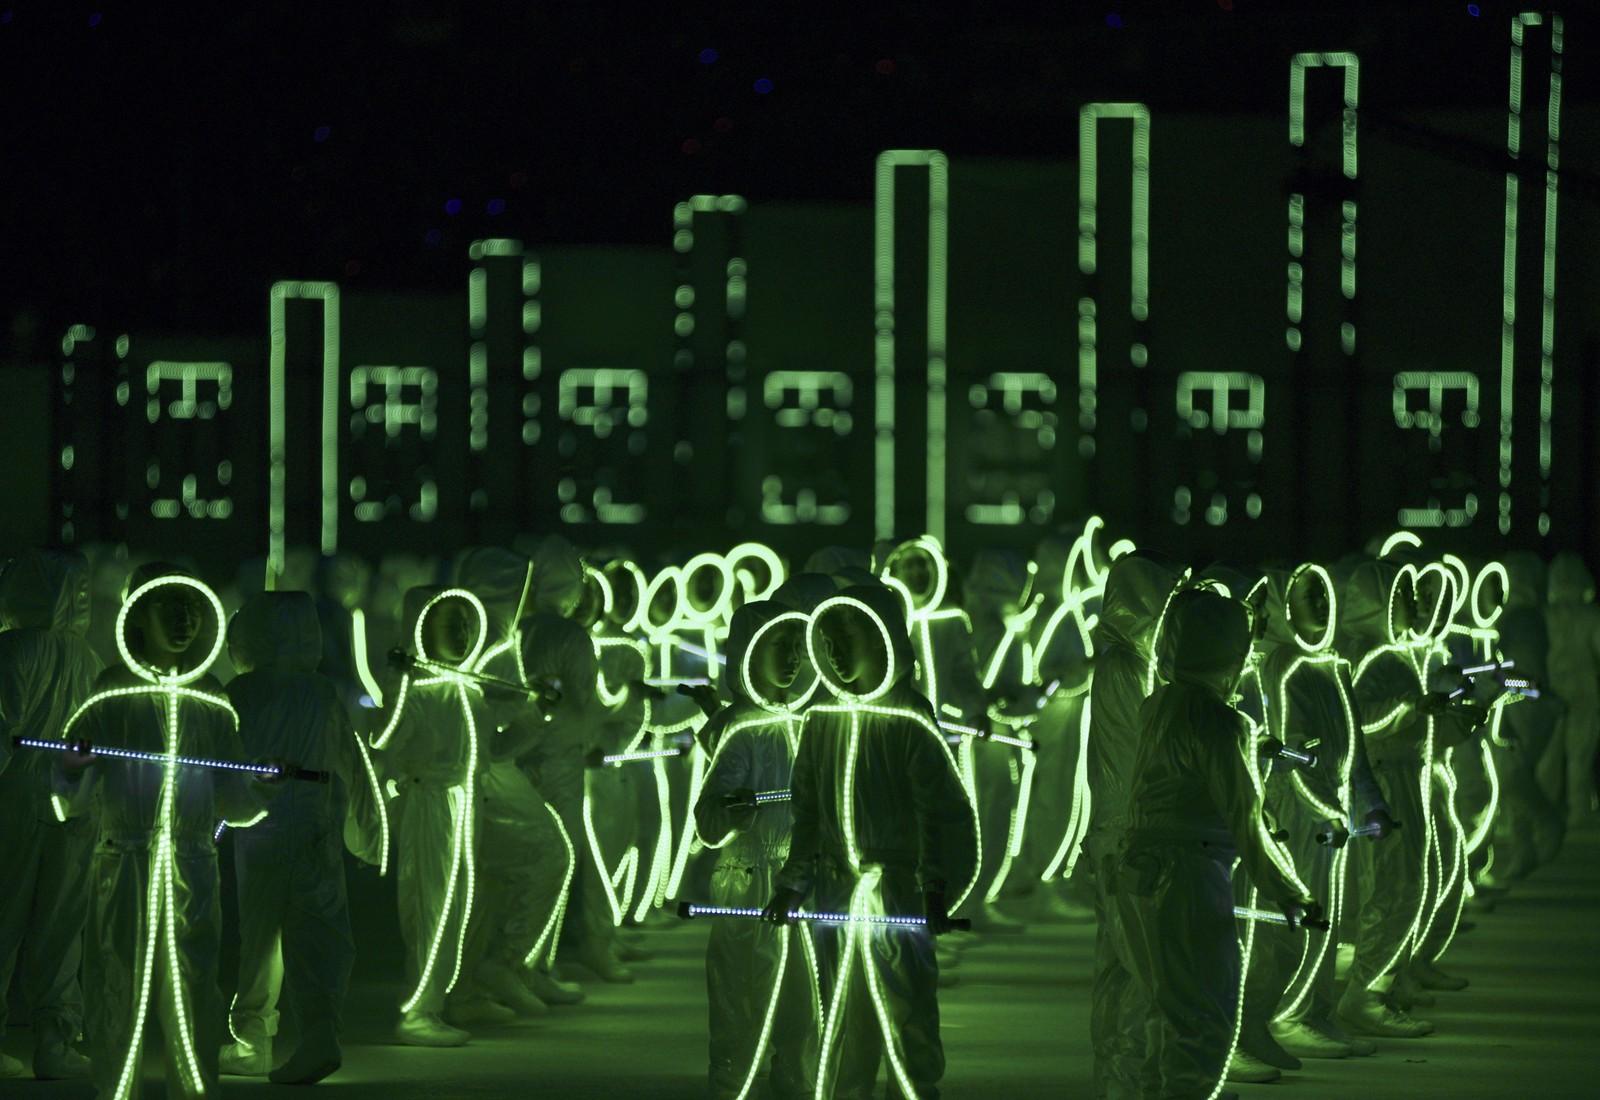 Barn kledd med LED-pærer danset denne uka under Singapores Golden Jubilee.